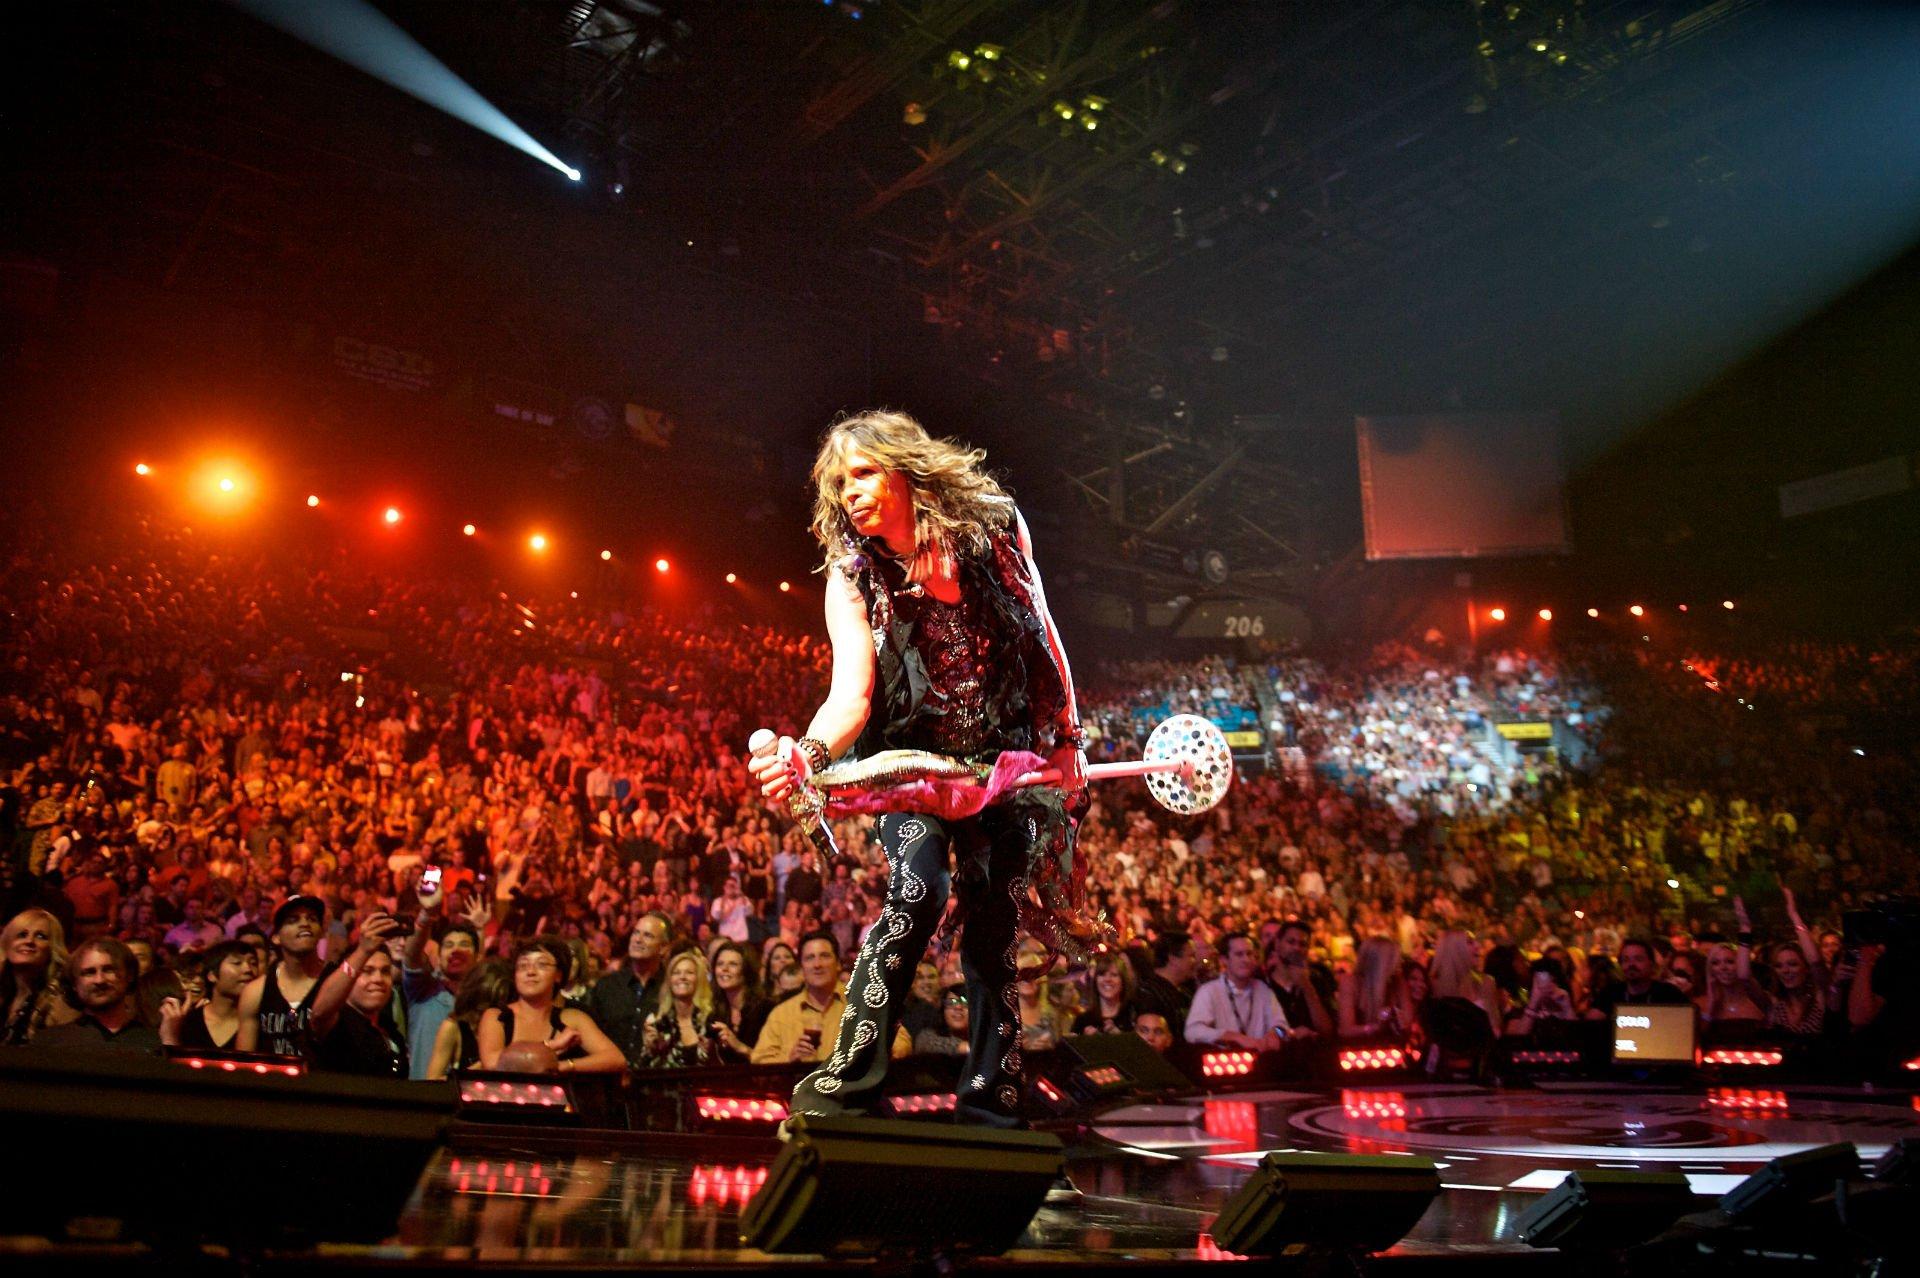 aerosmith steven tyler hard rock concert crowd stage light stars 1920x1278